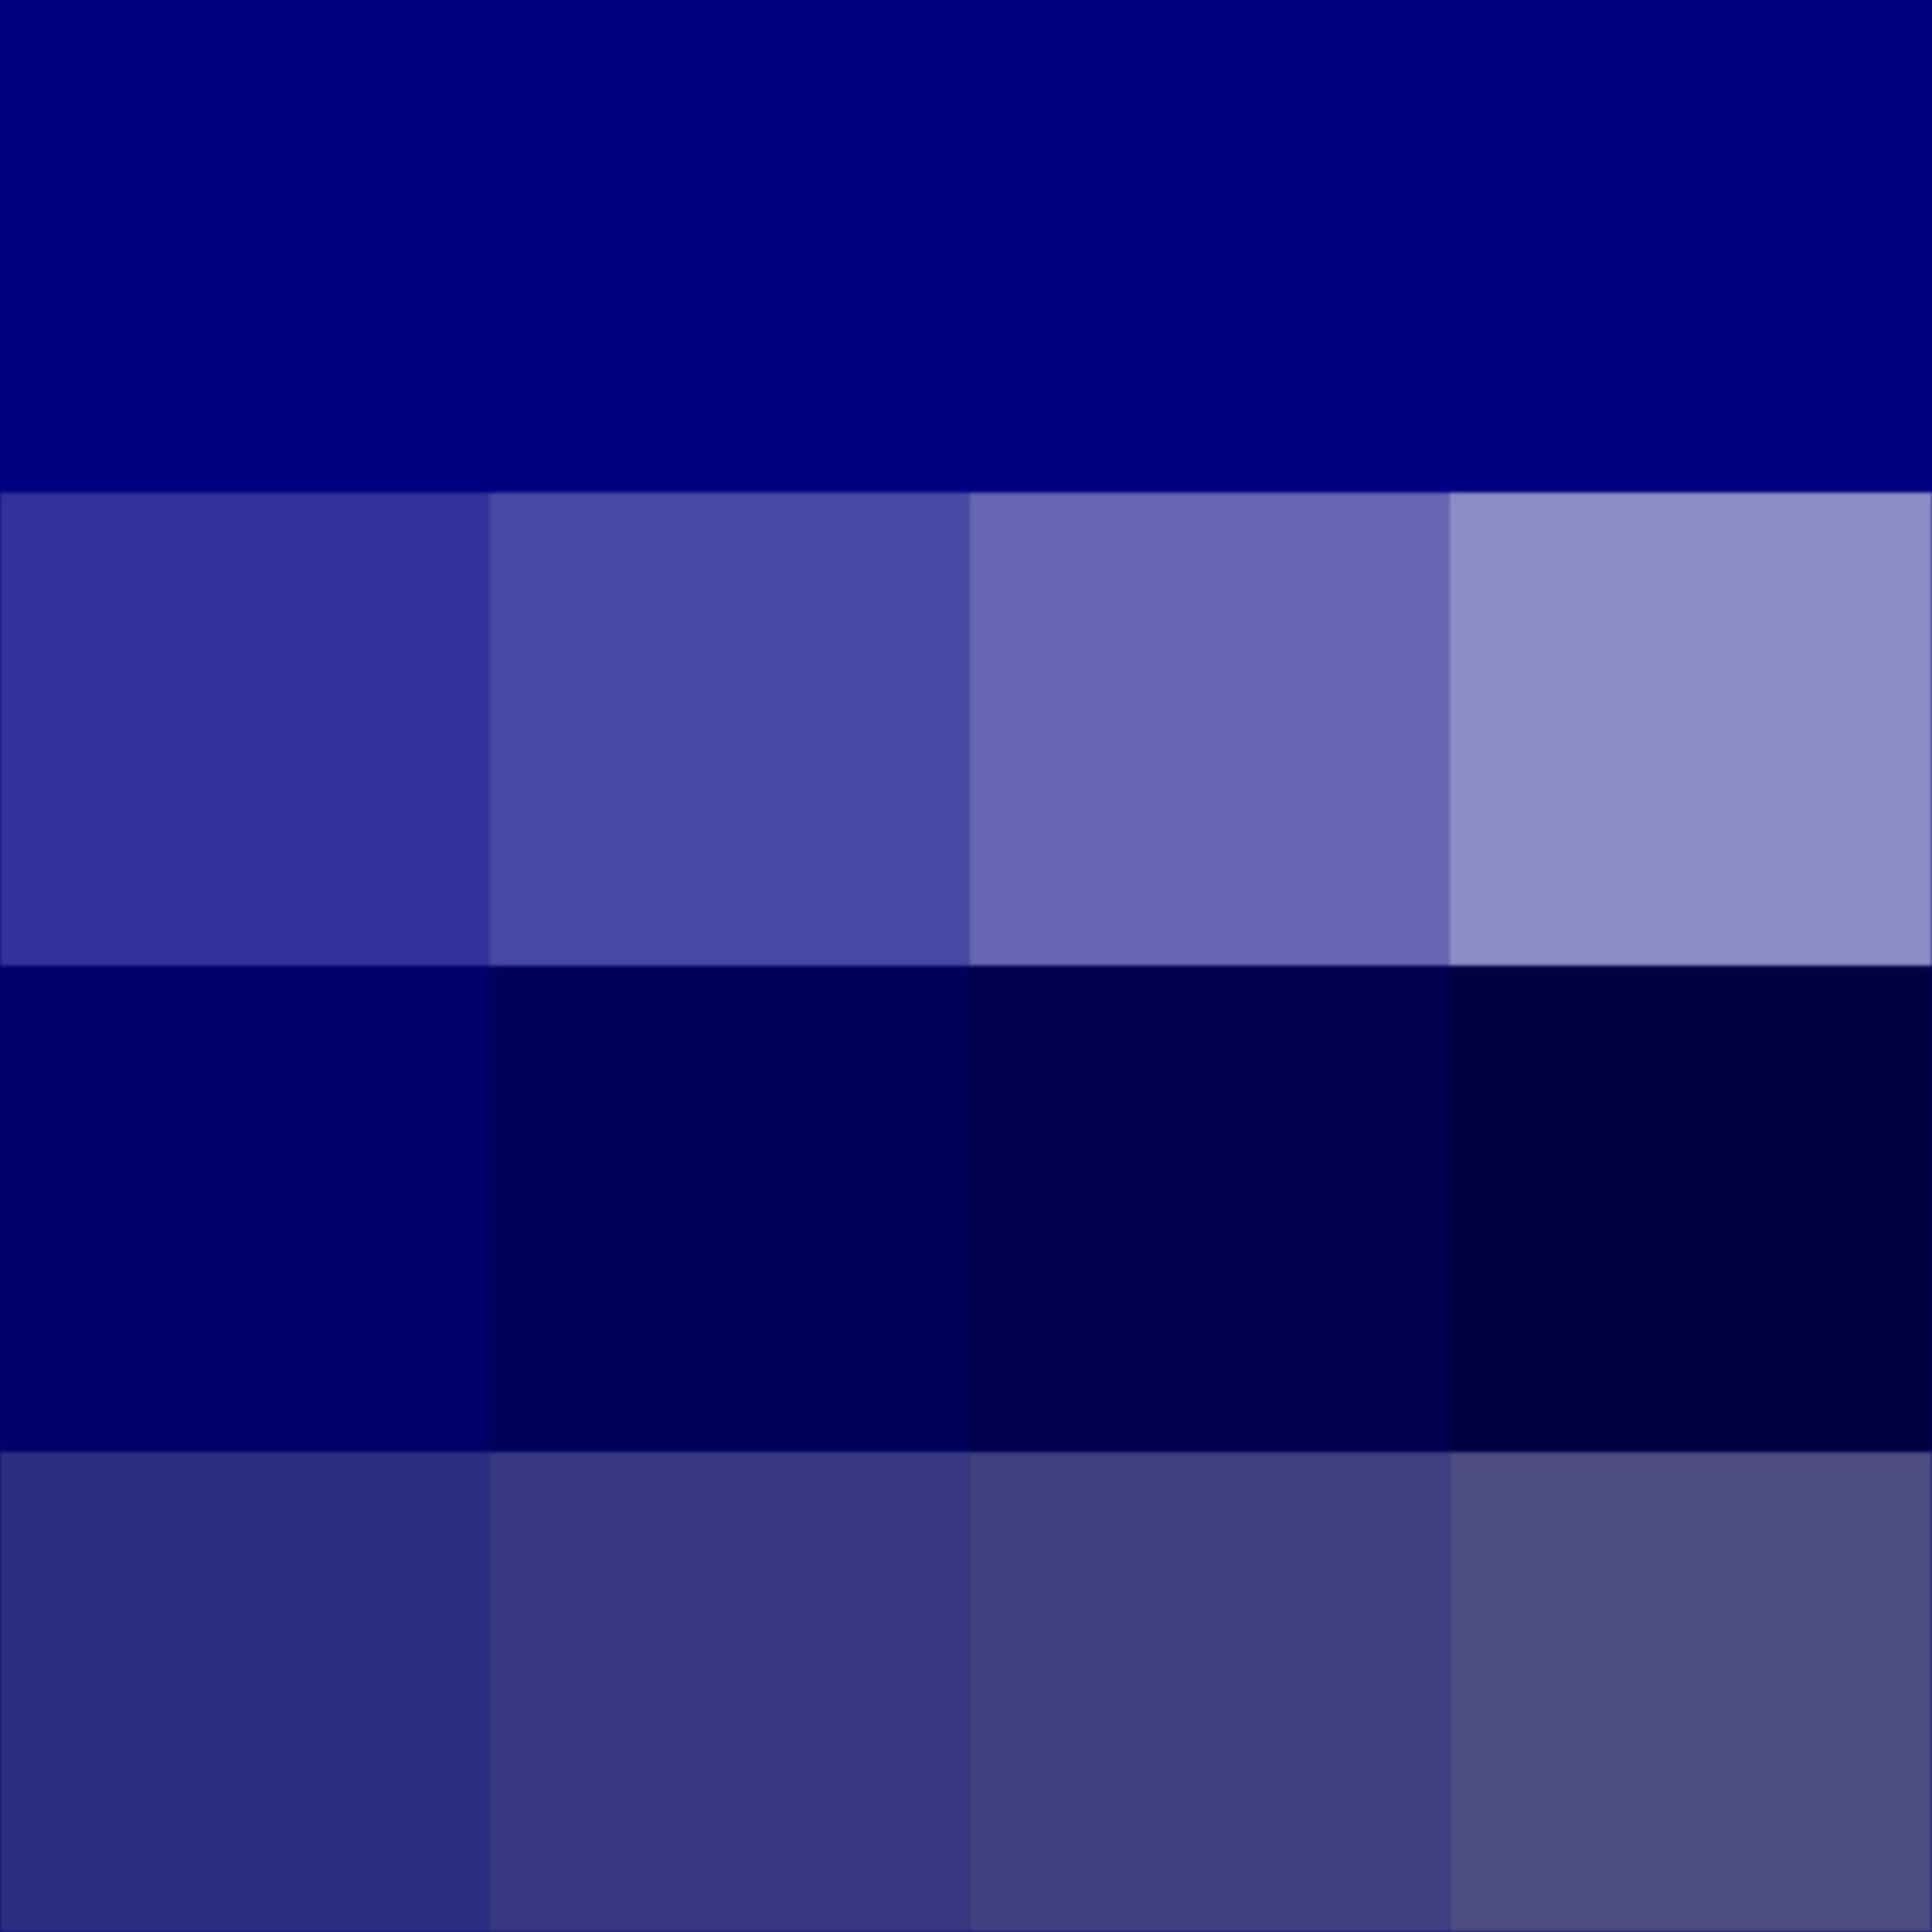 navy blue shades design pinterest